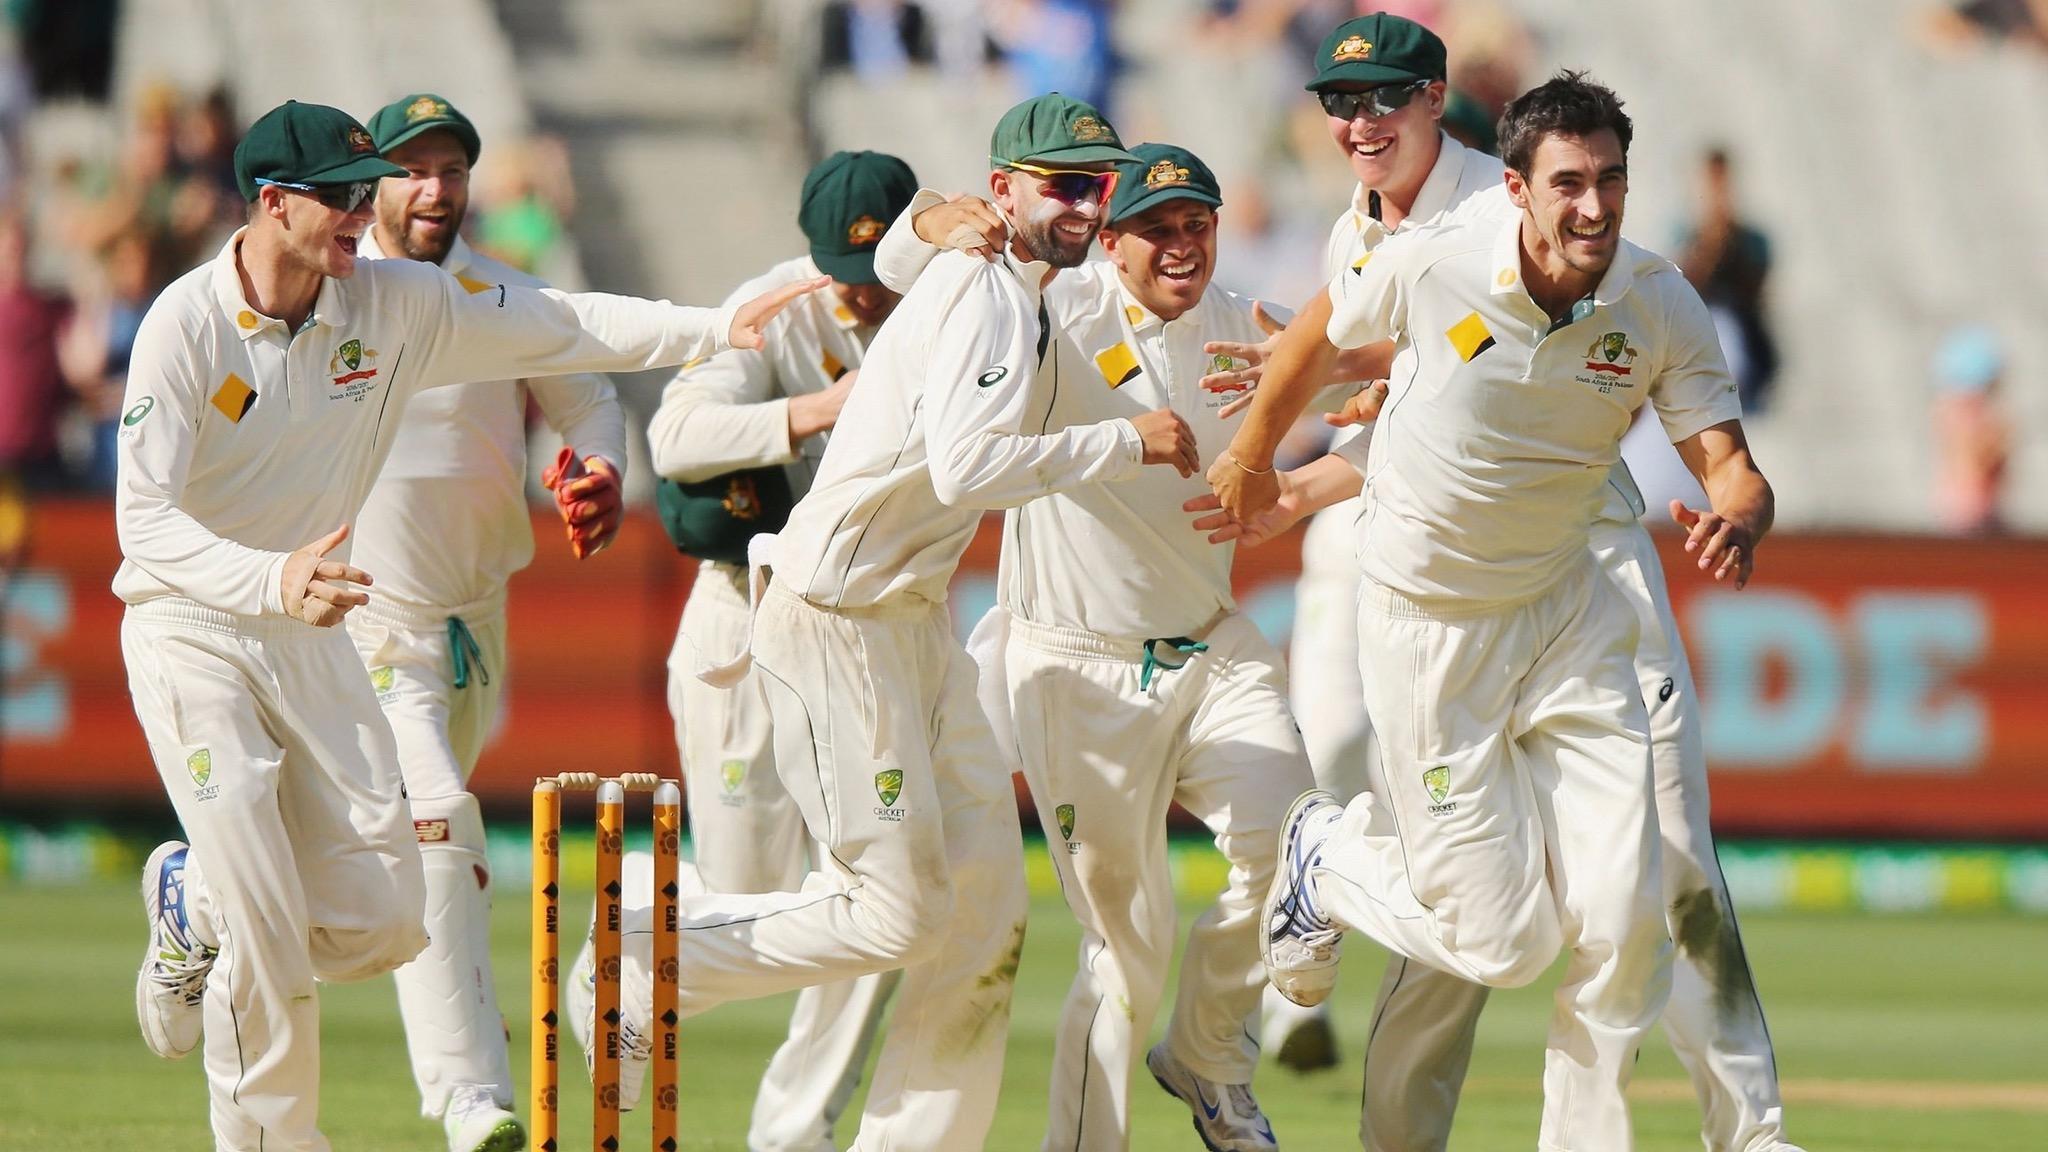 Australian Men's Test team celebrating a wicket,Getty Images/Cricket Australia, Michael Dodge